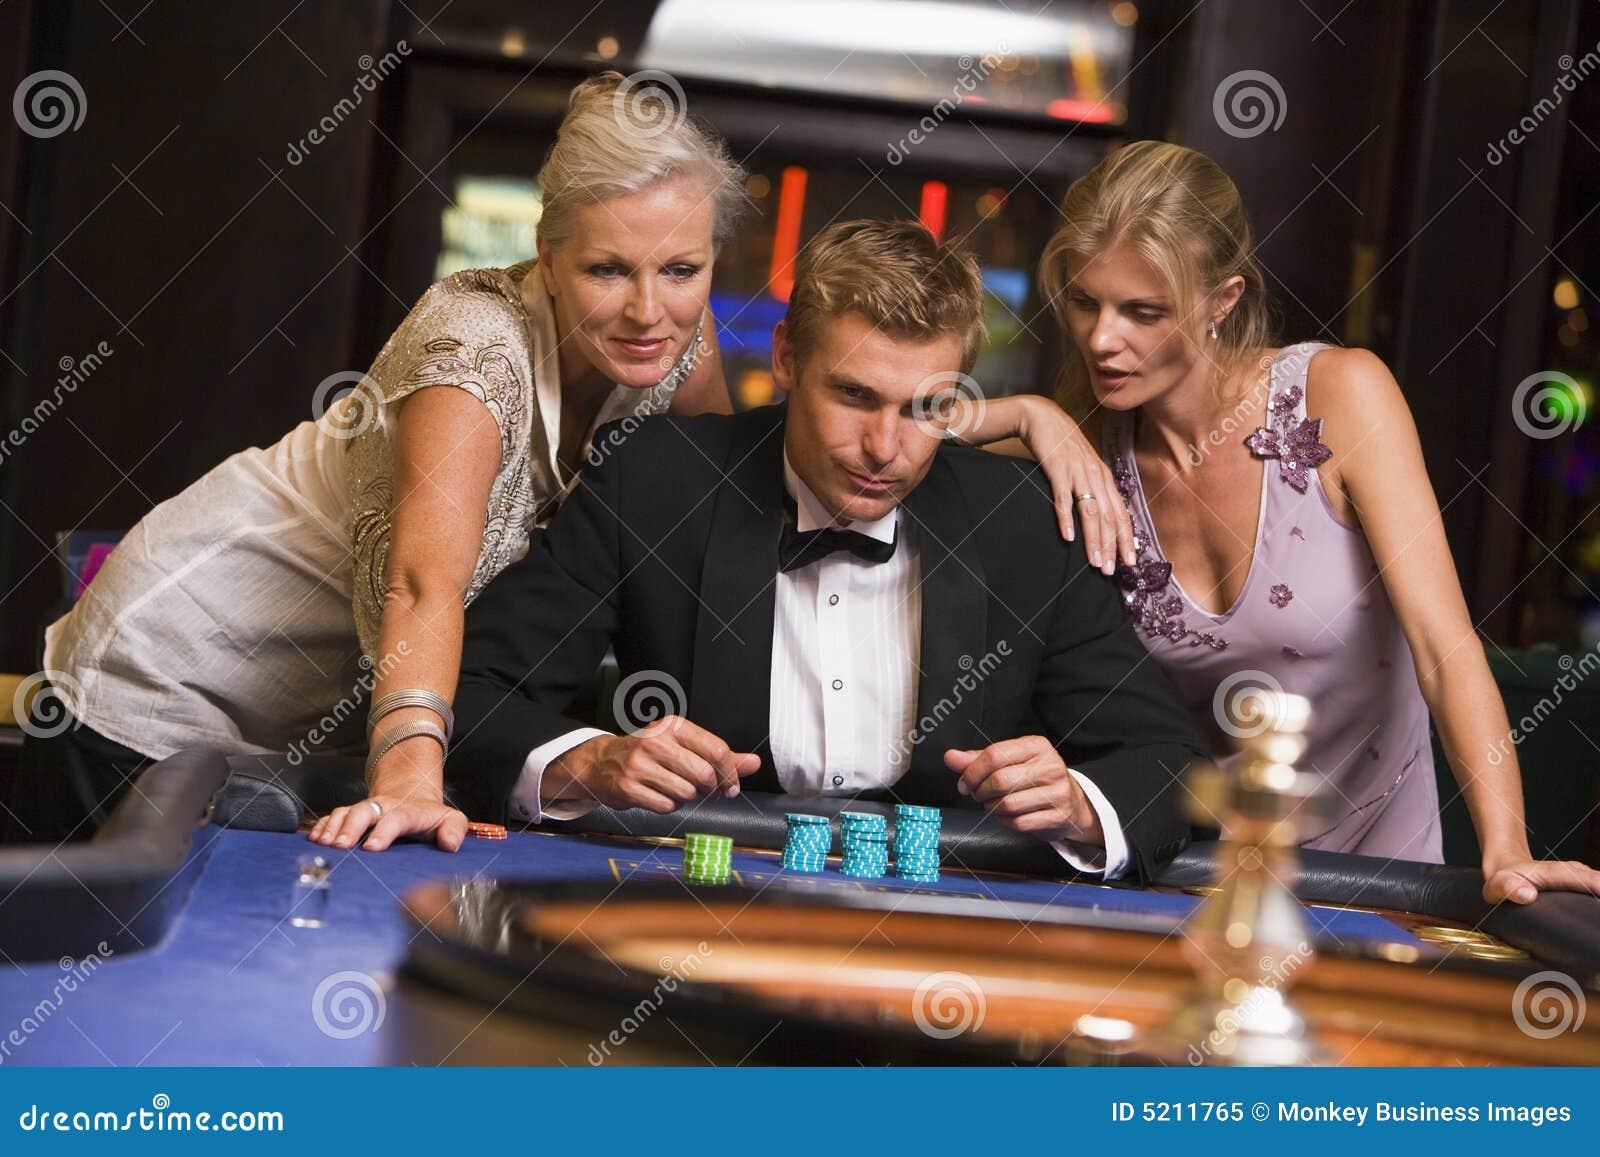 club player casino free chips